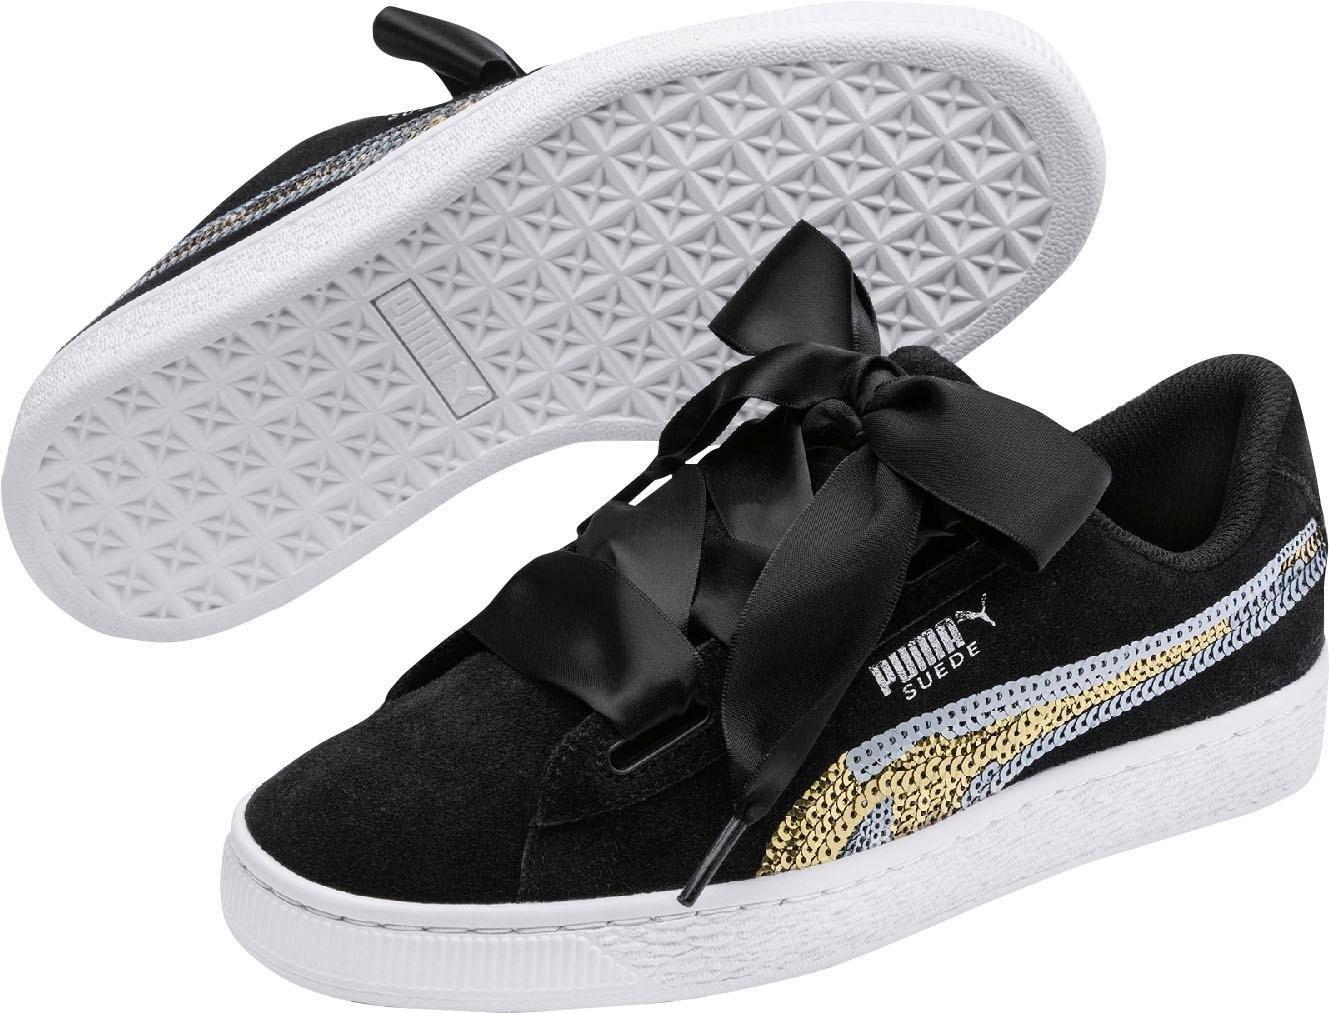 c03ac80f8e9 ... PUMA sneakers »Suede Heart Trailblazer SQN Jr«, PUMA sneakers »Breaker  Suede«, PUMA sneakers »Breaker Suede«